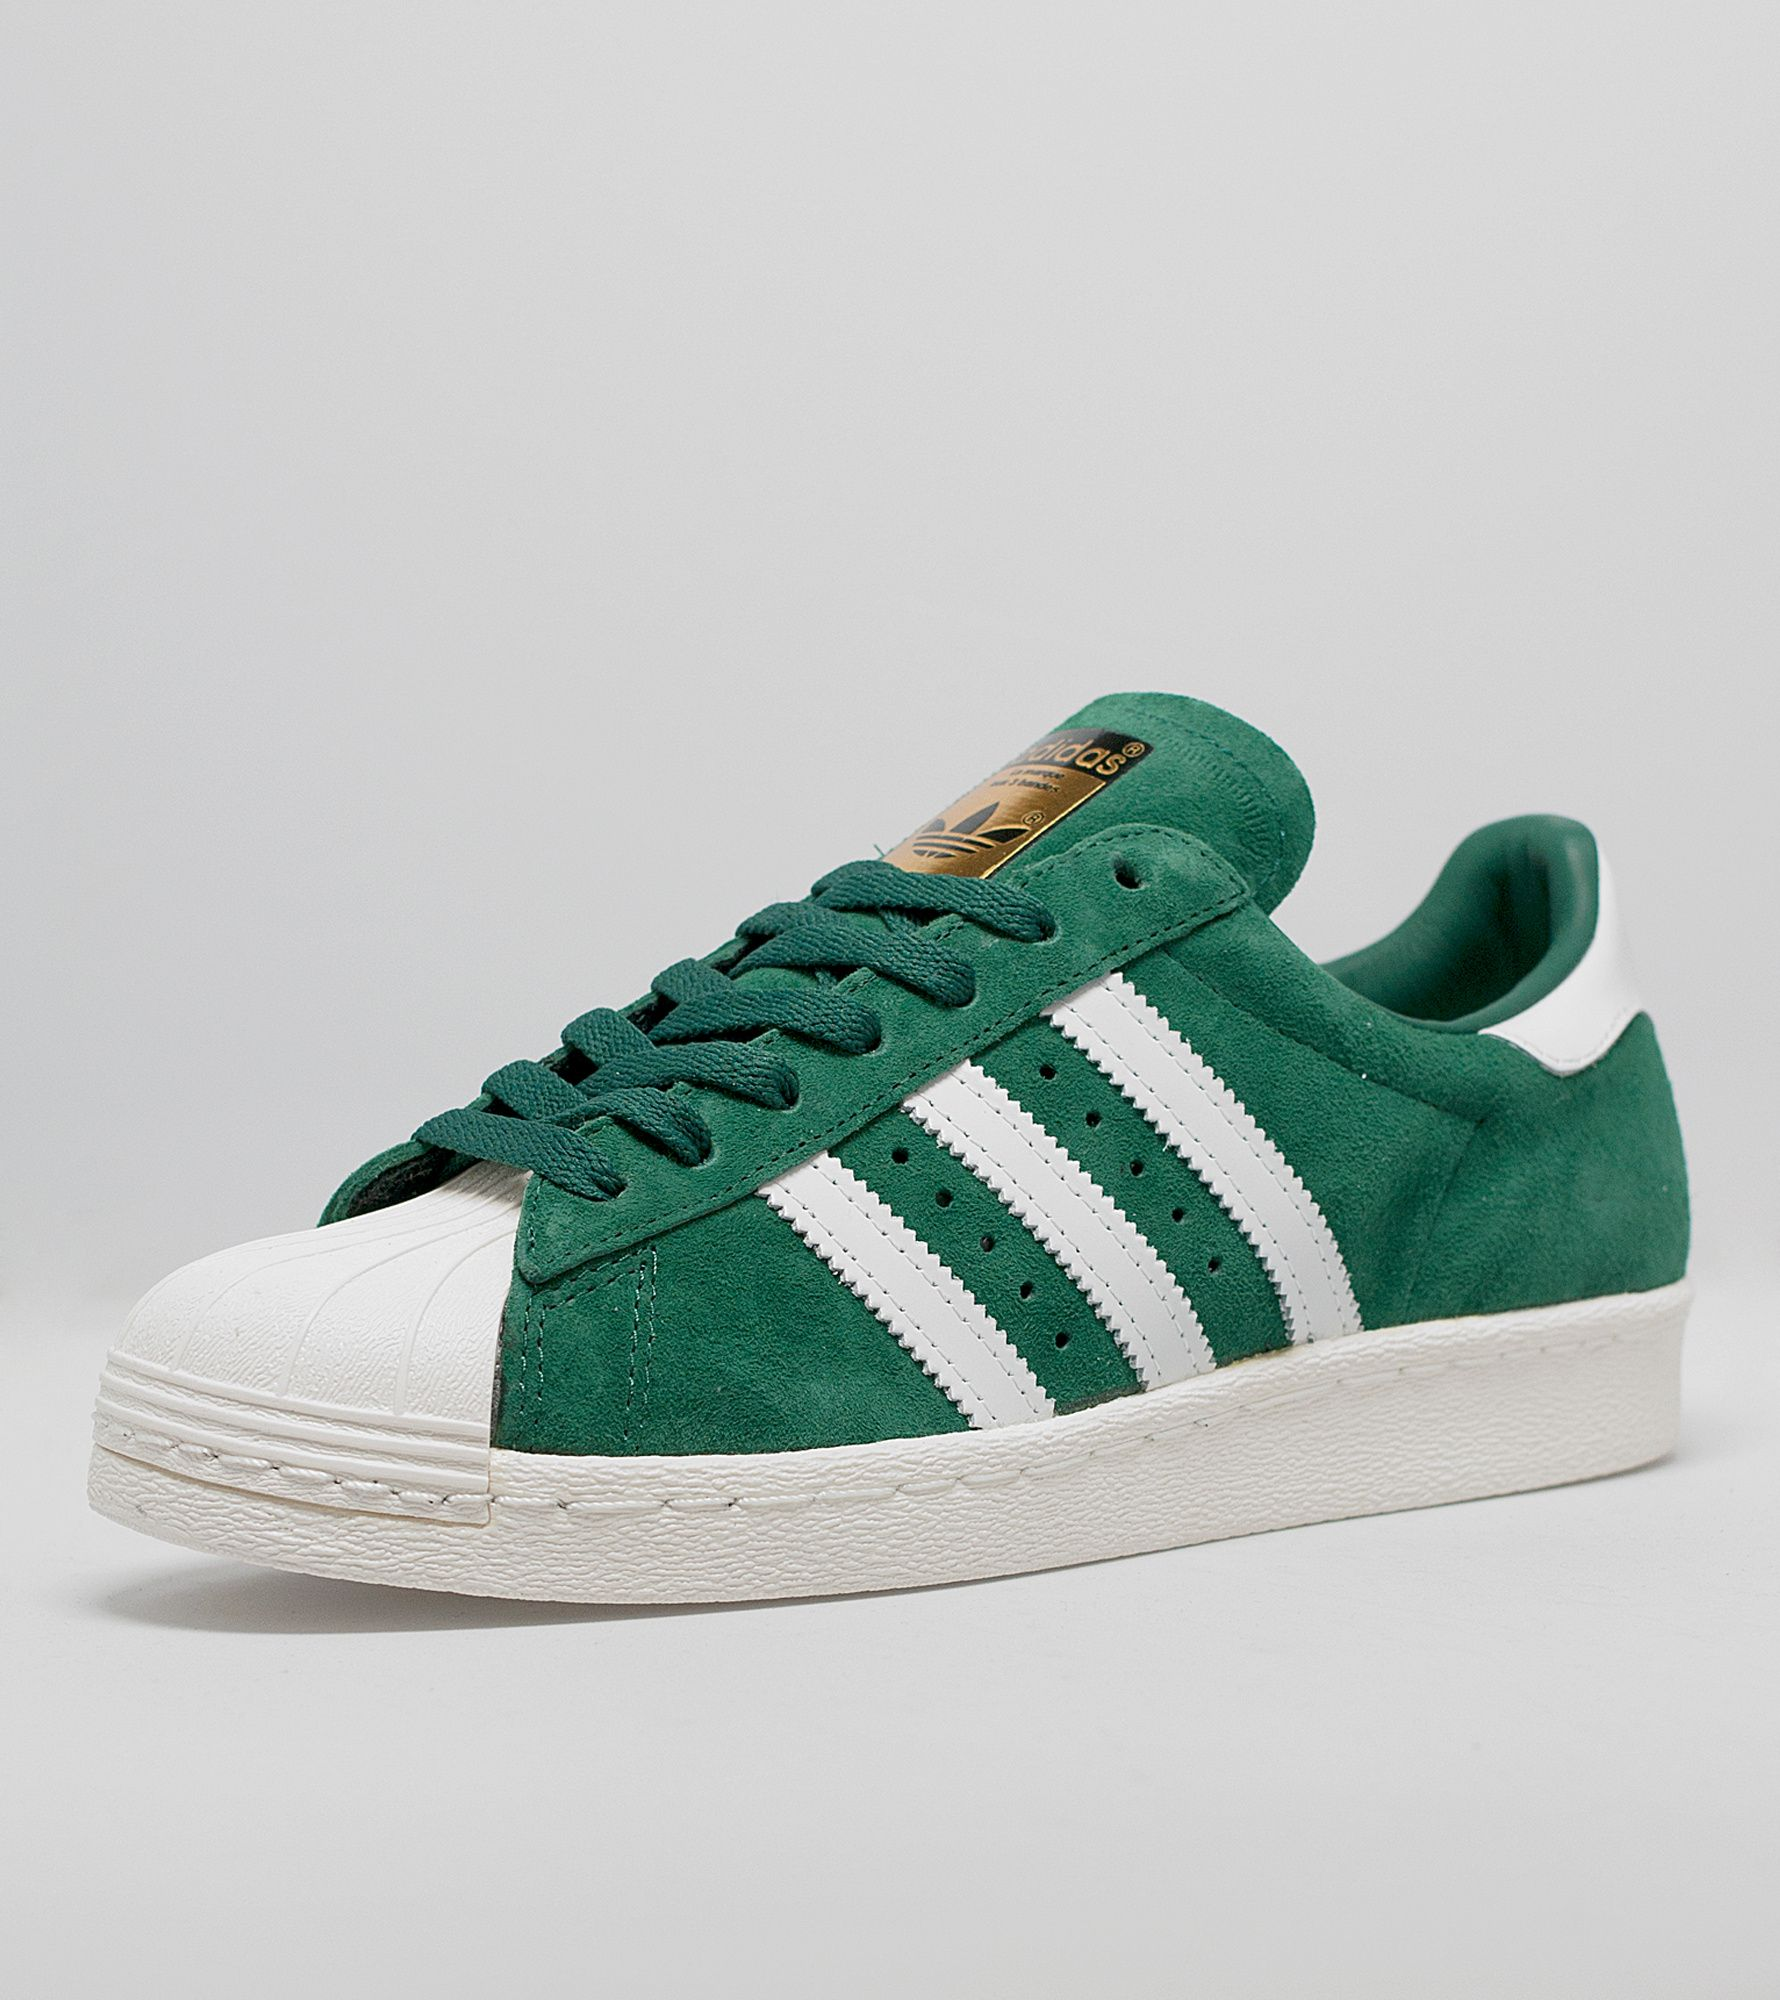 adidas superstar green